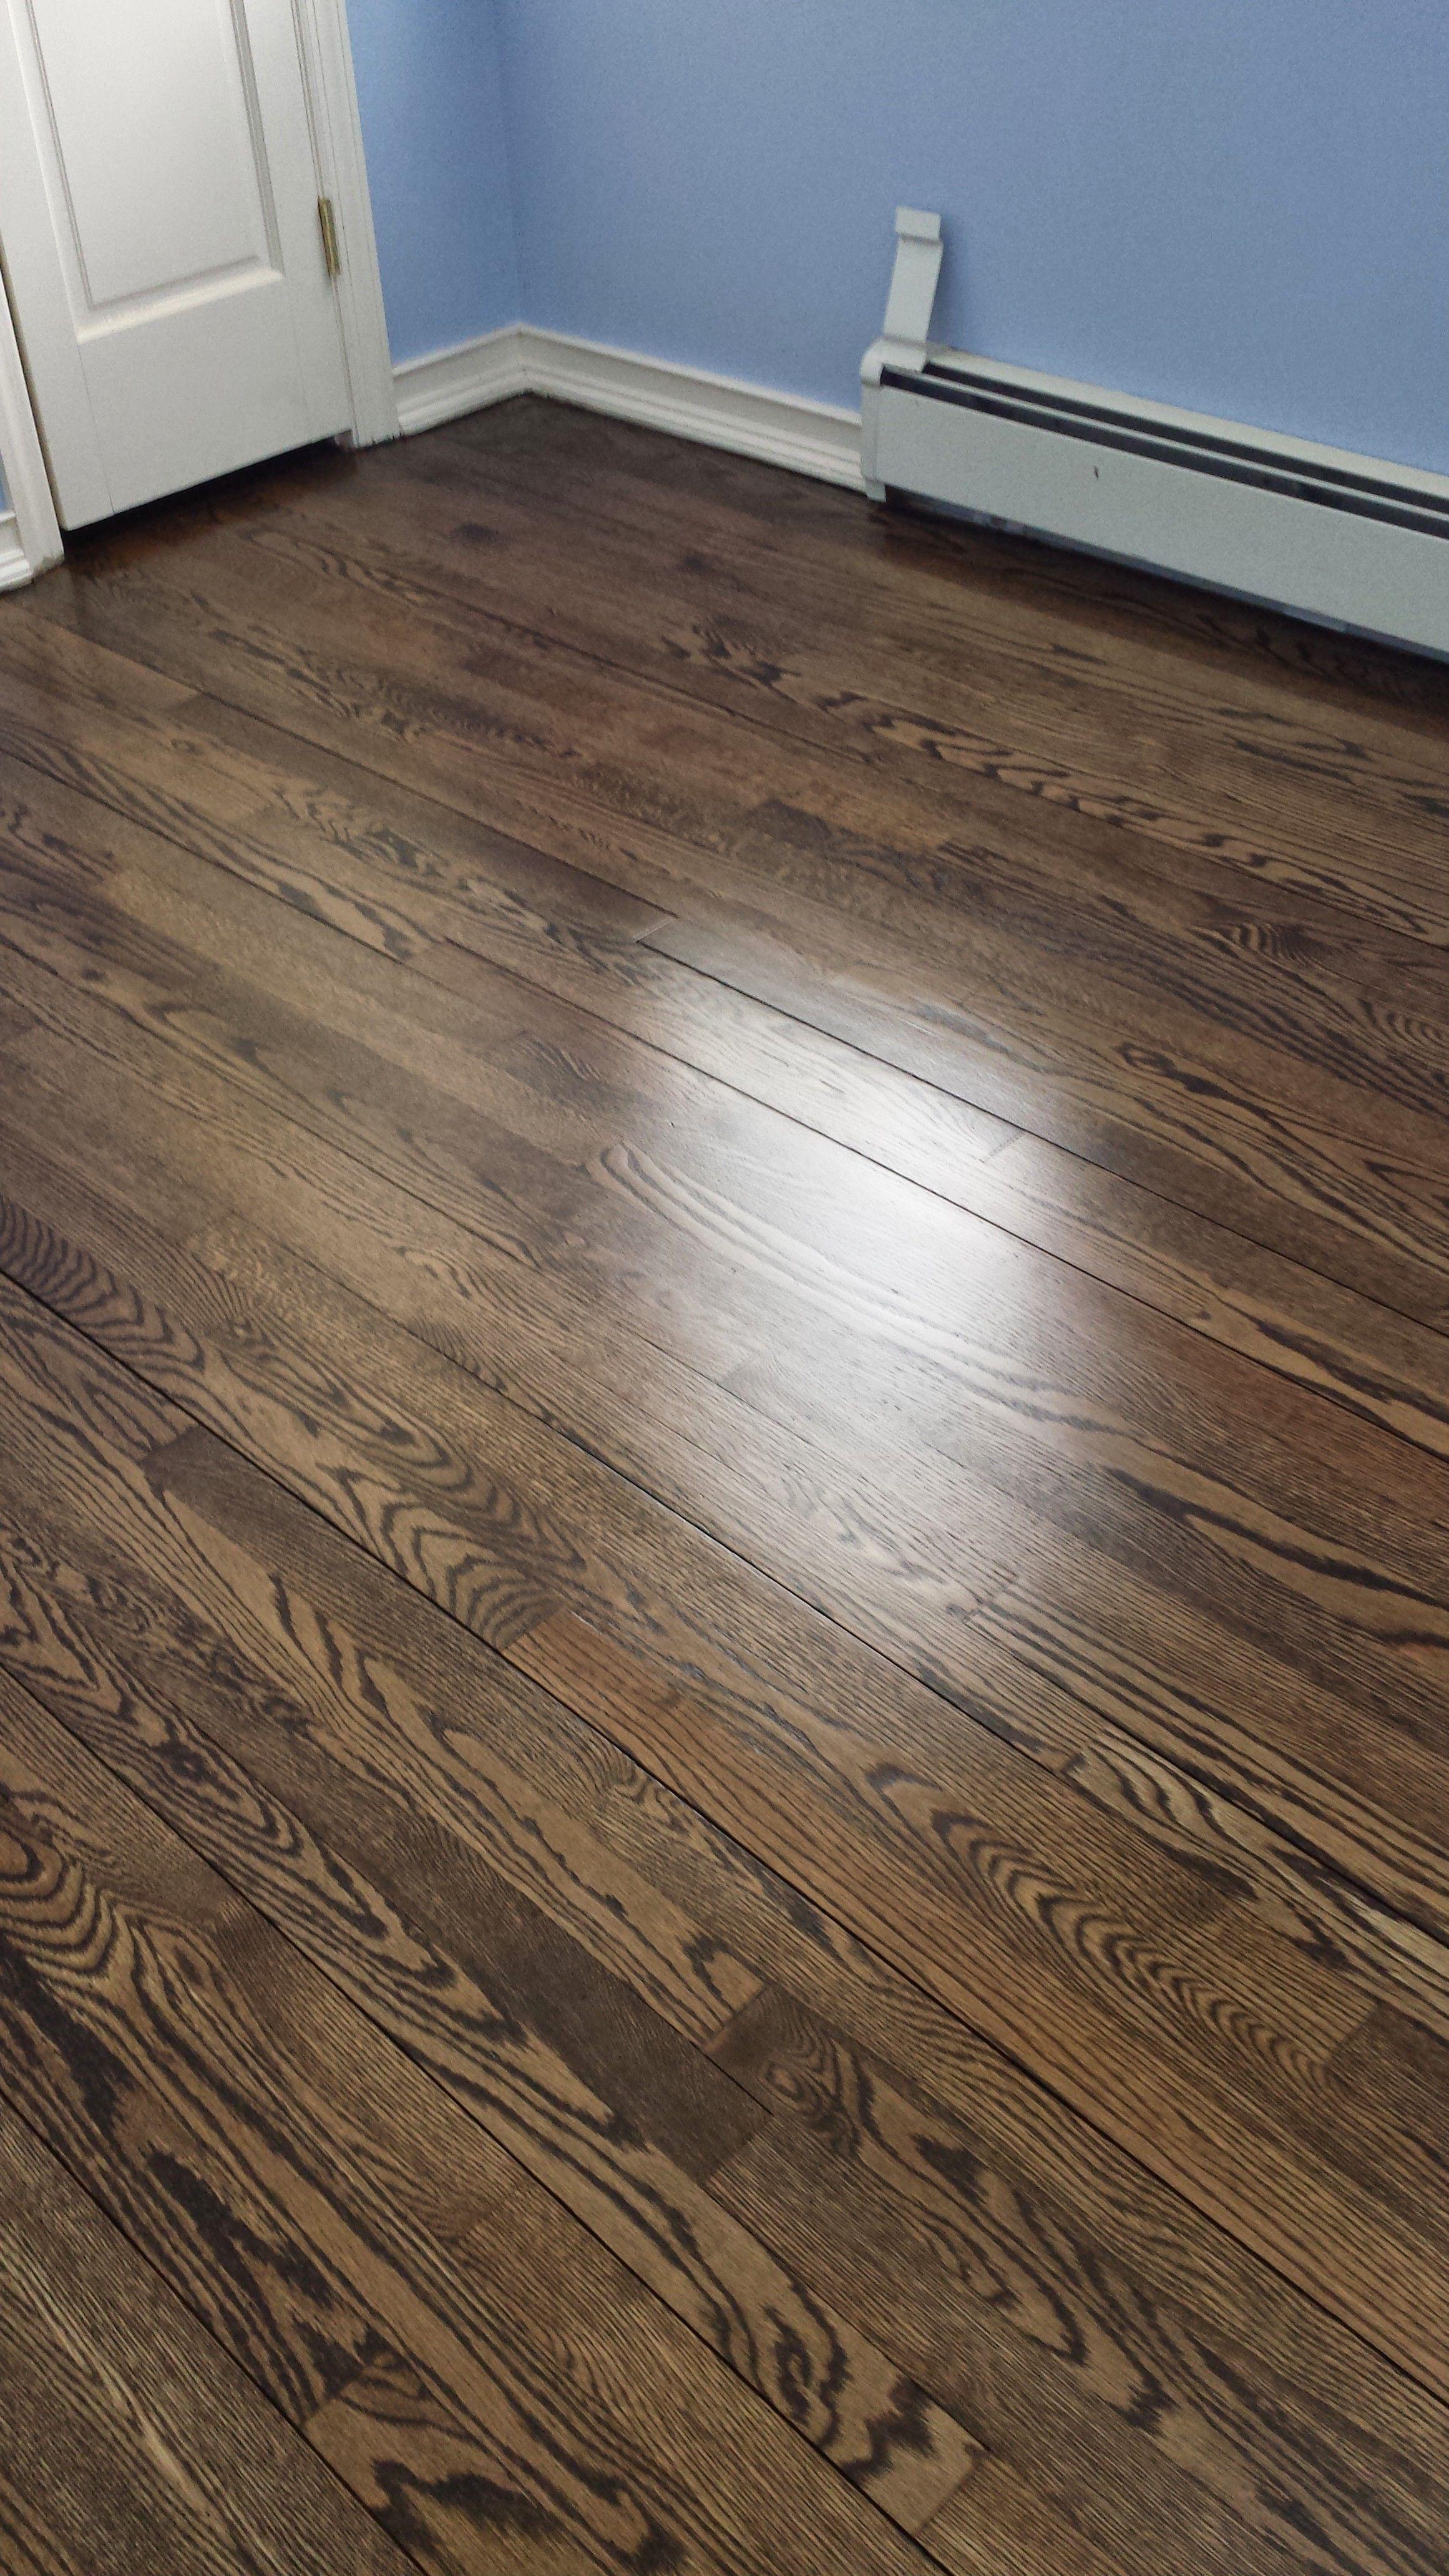 walnut hardwood flooring cost of hardwood floor wood floor plan ideas with hardwood floor wood great methods to use for refinishing hardwood floors